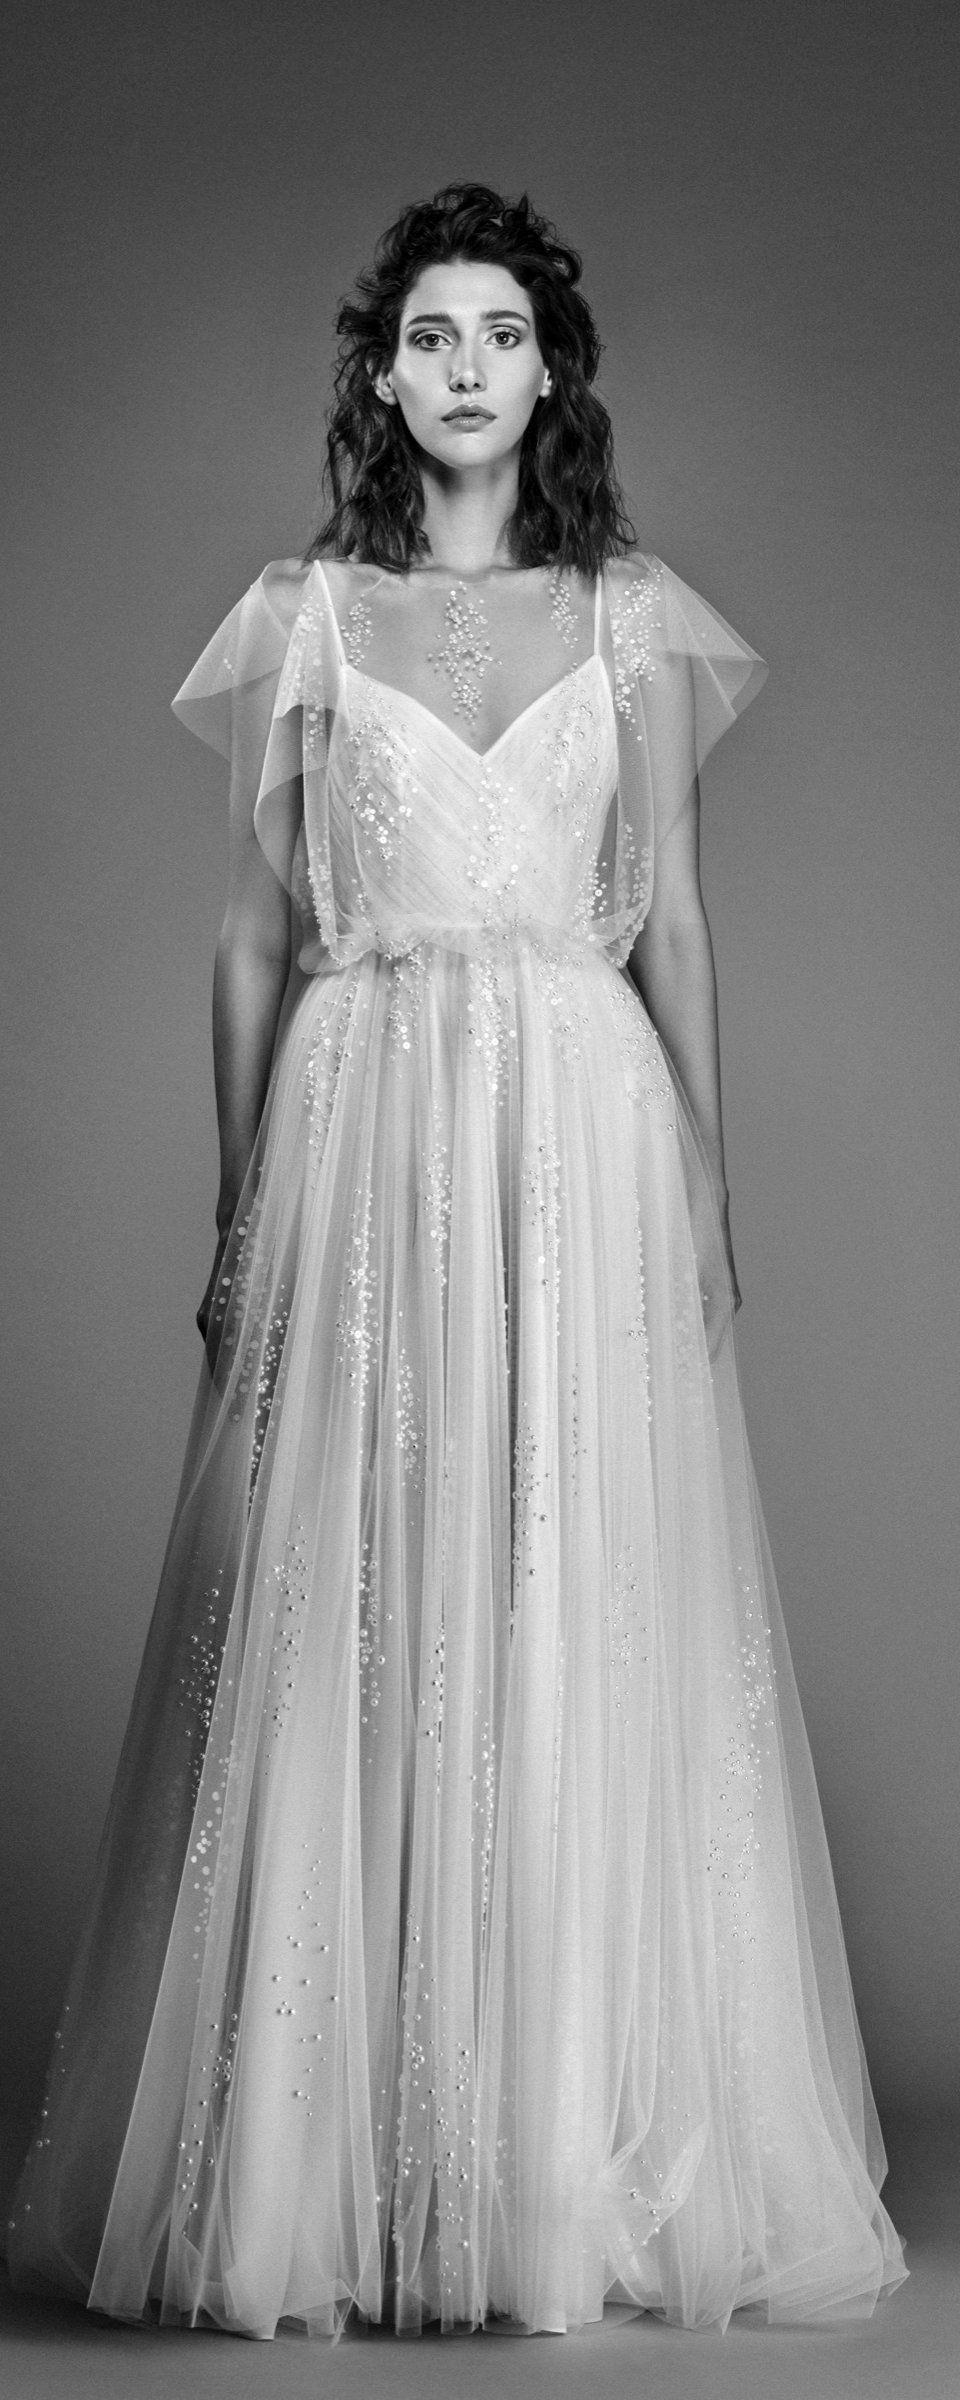 Off white short wedding dresses  Sandy Nour  collection  Bridal  Pinterest  Wedding dress